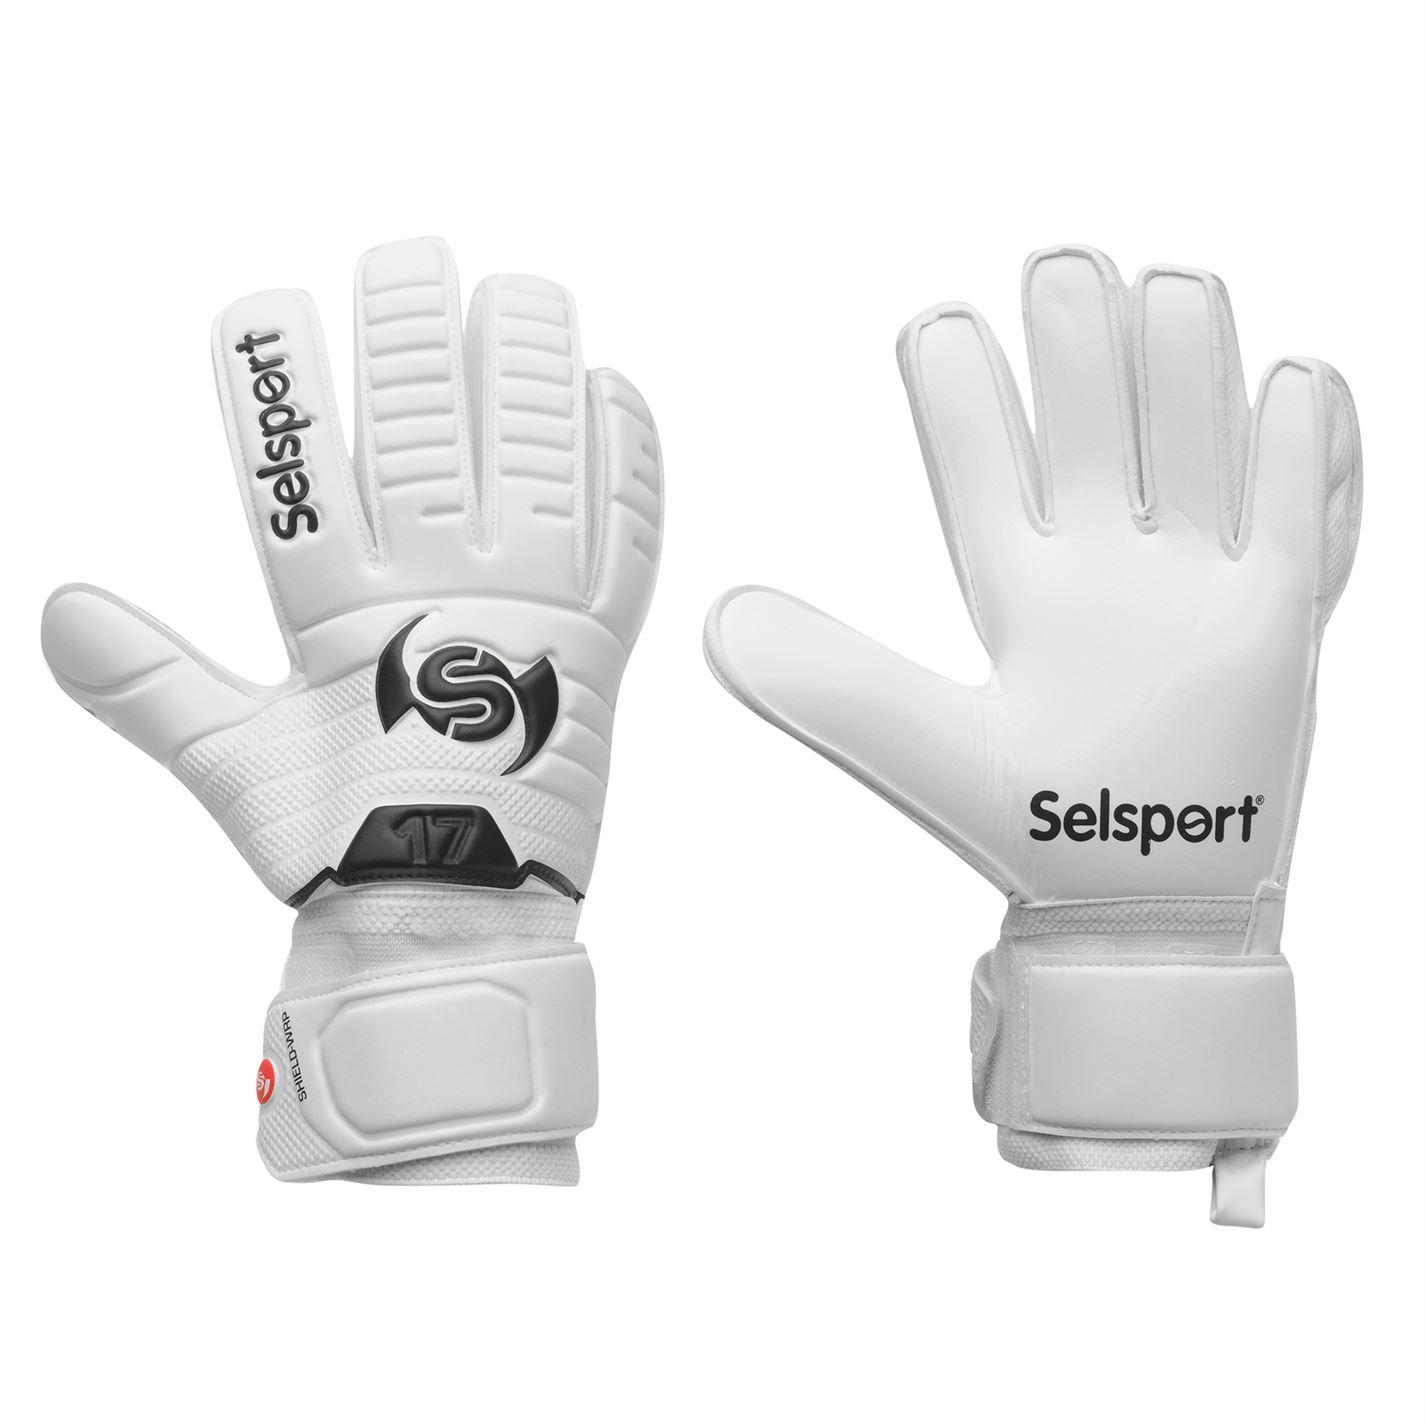 Selsport Wrappa Classic Goalkeeper Gloves Mens